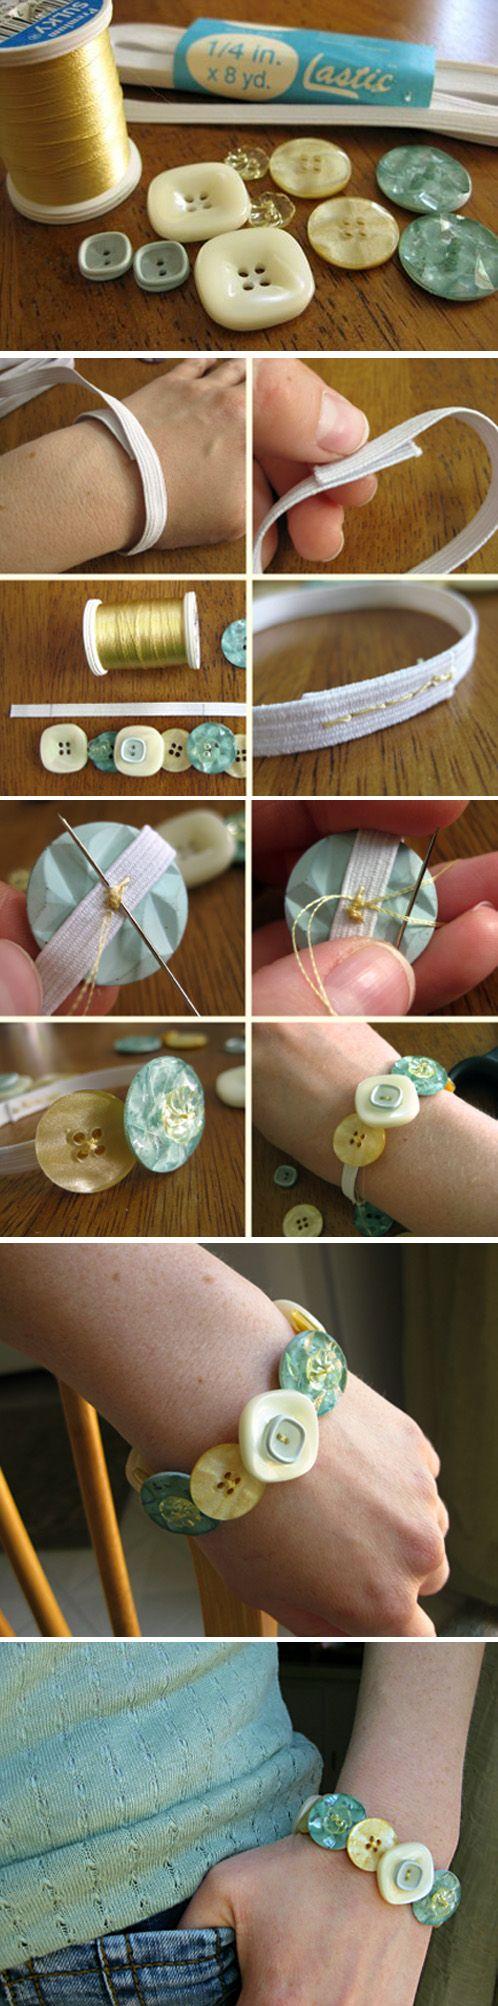 pulsera-botones-diy-muy-ingenioso-1